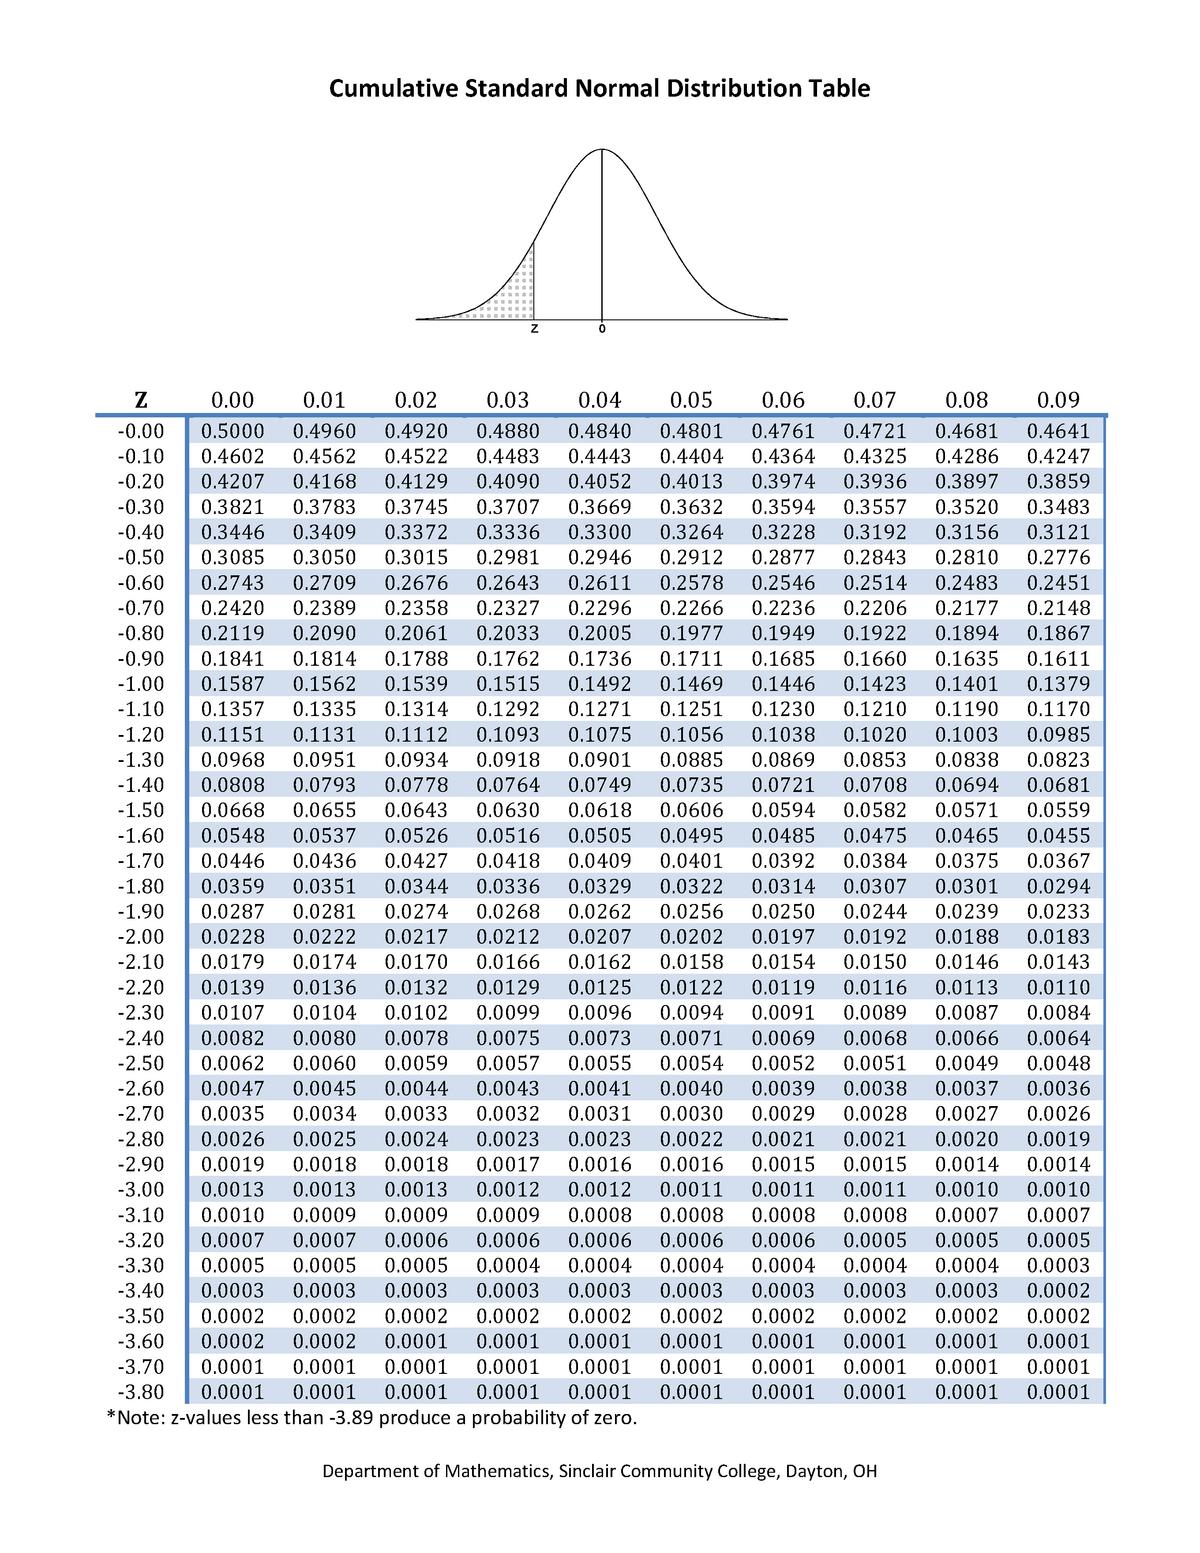 Cumulative Standard Normal Distribution Table Econ 3400